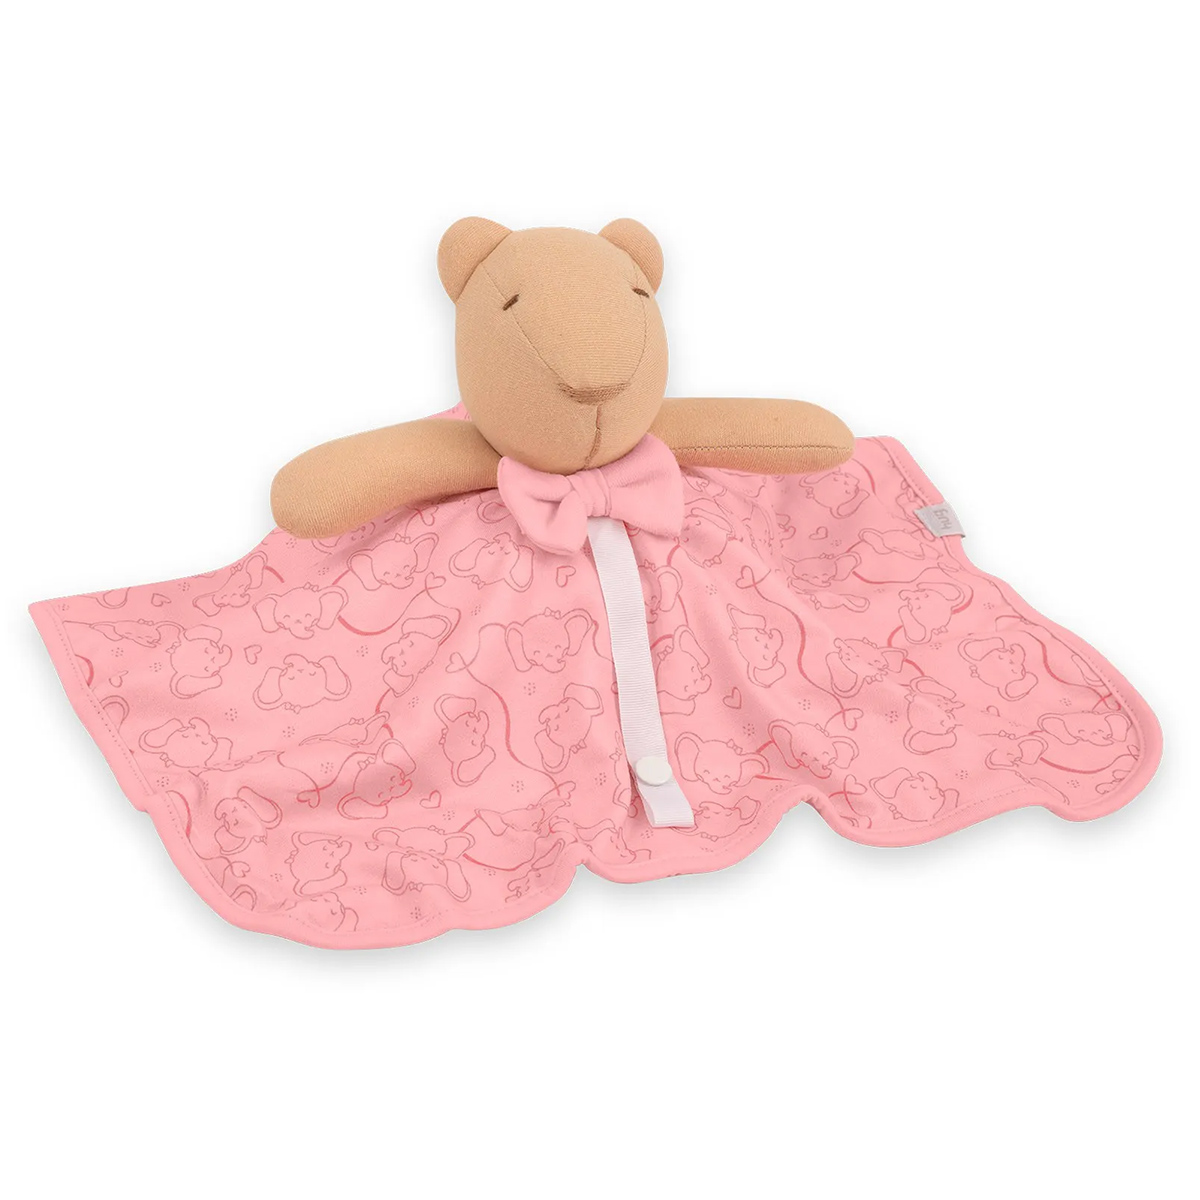 Naninha Hug Baby Elefante Bailarina